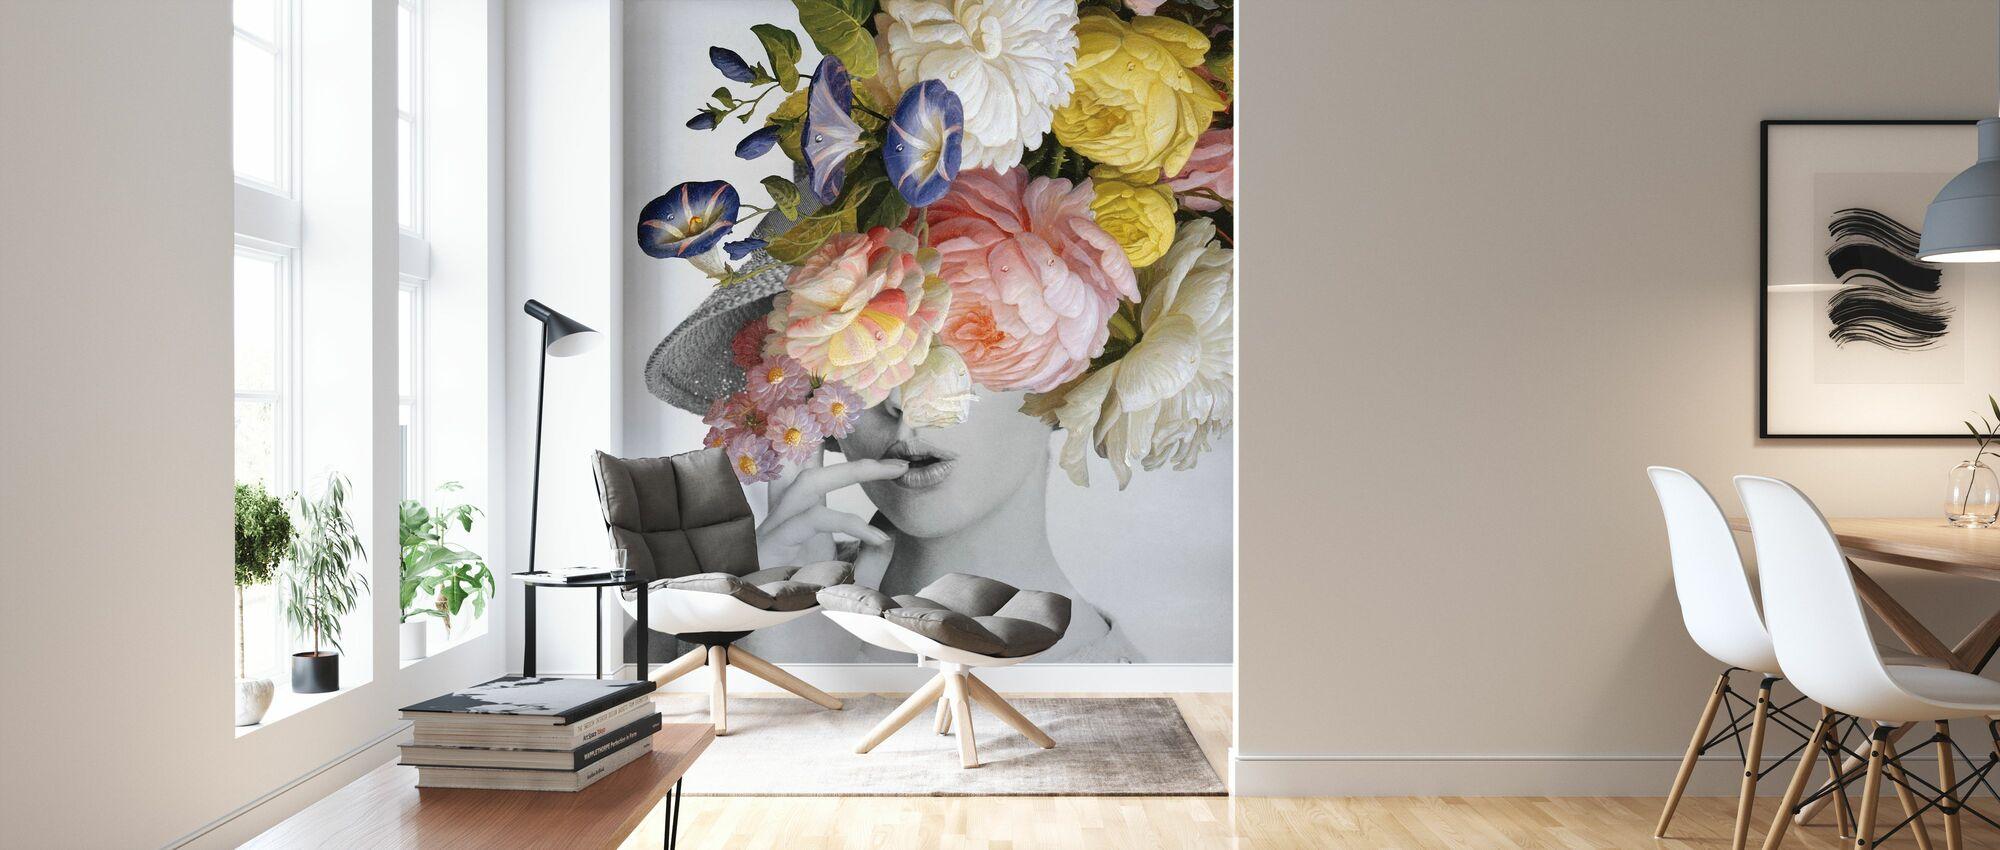 Garden Party I - Wallpaper - Living Room